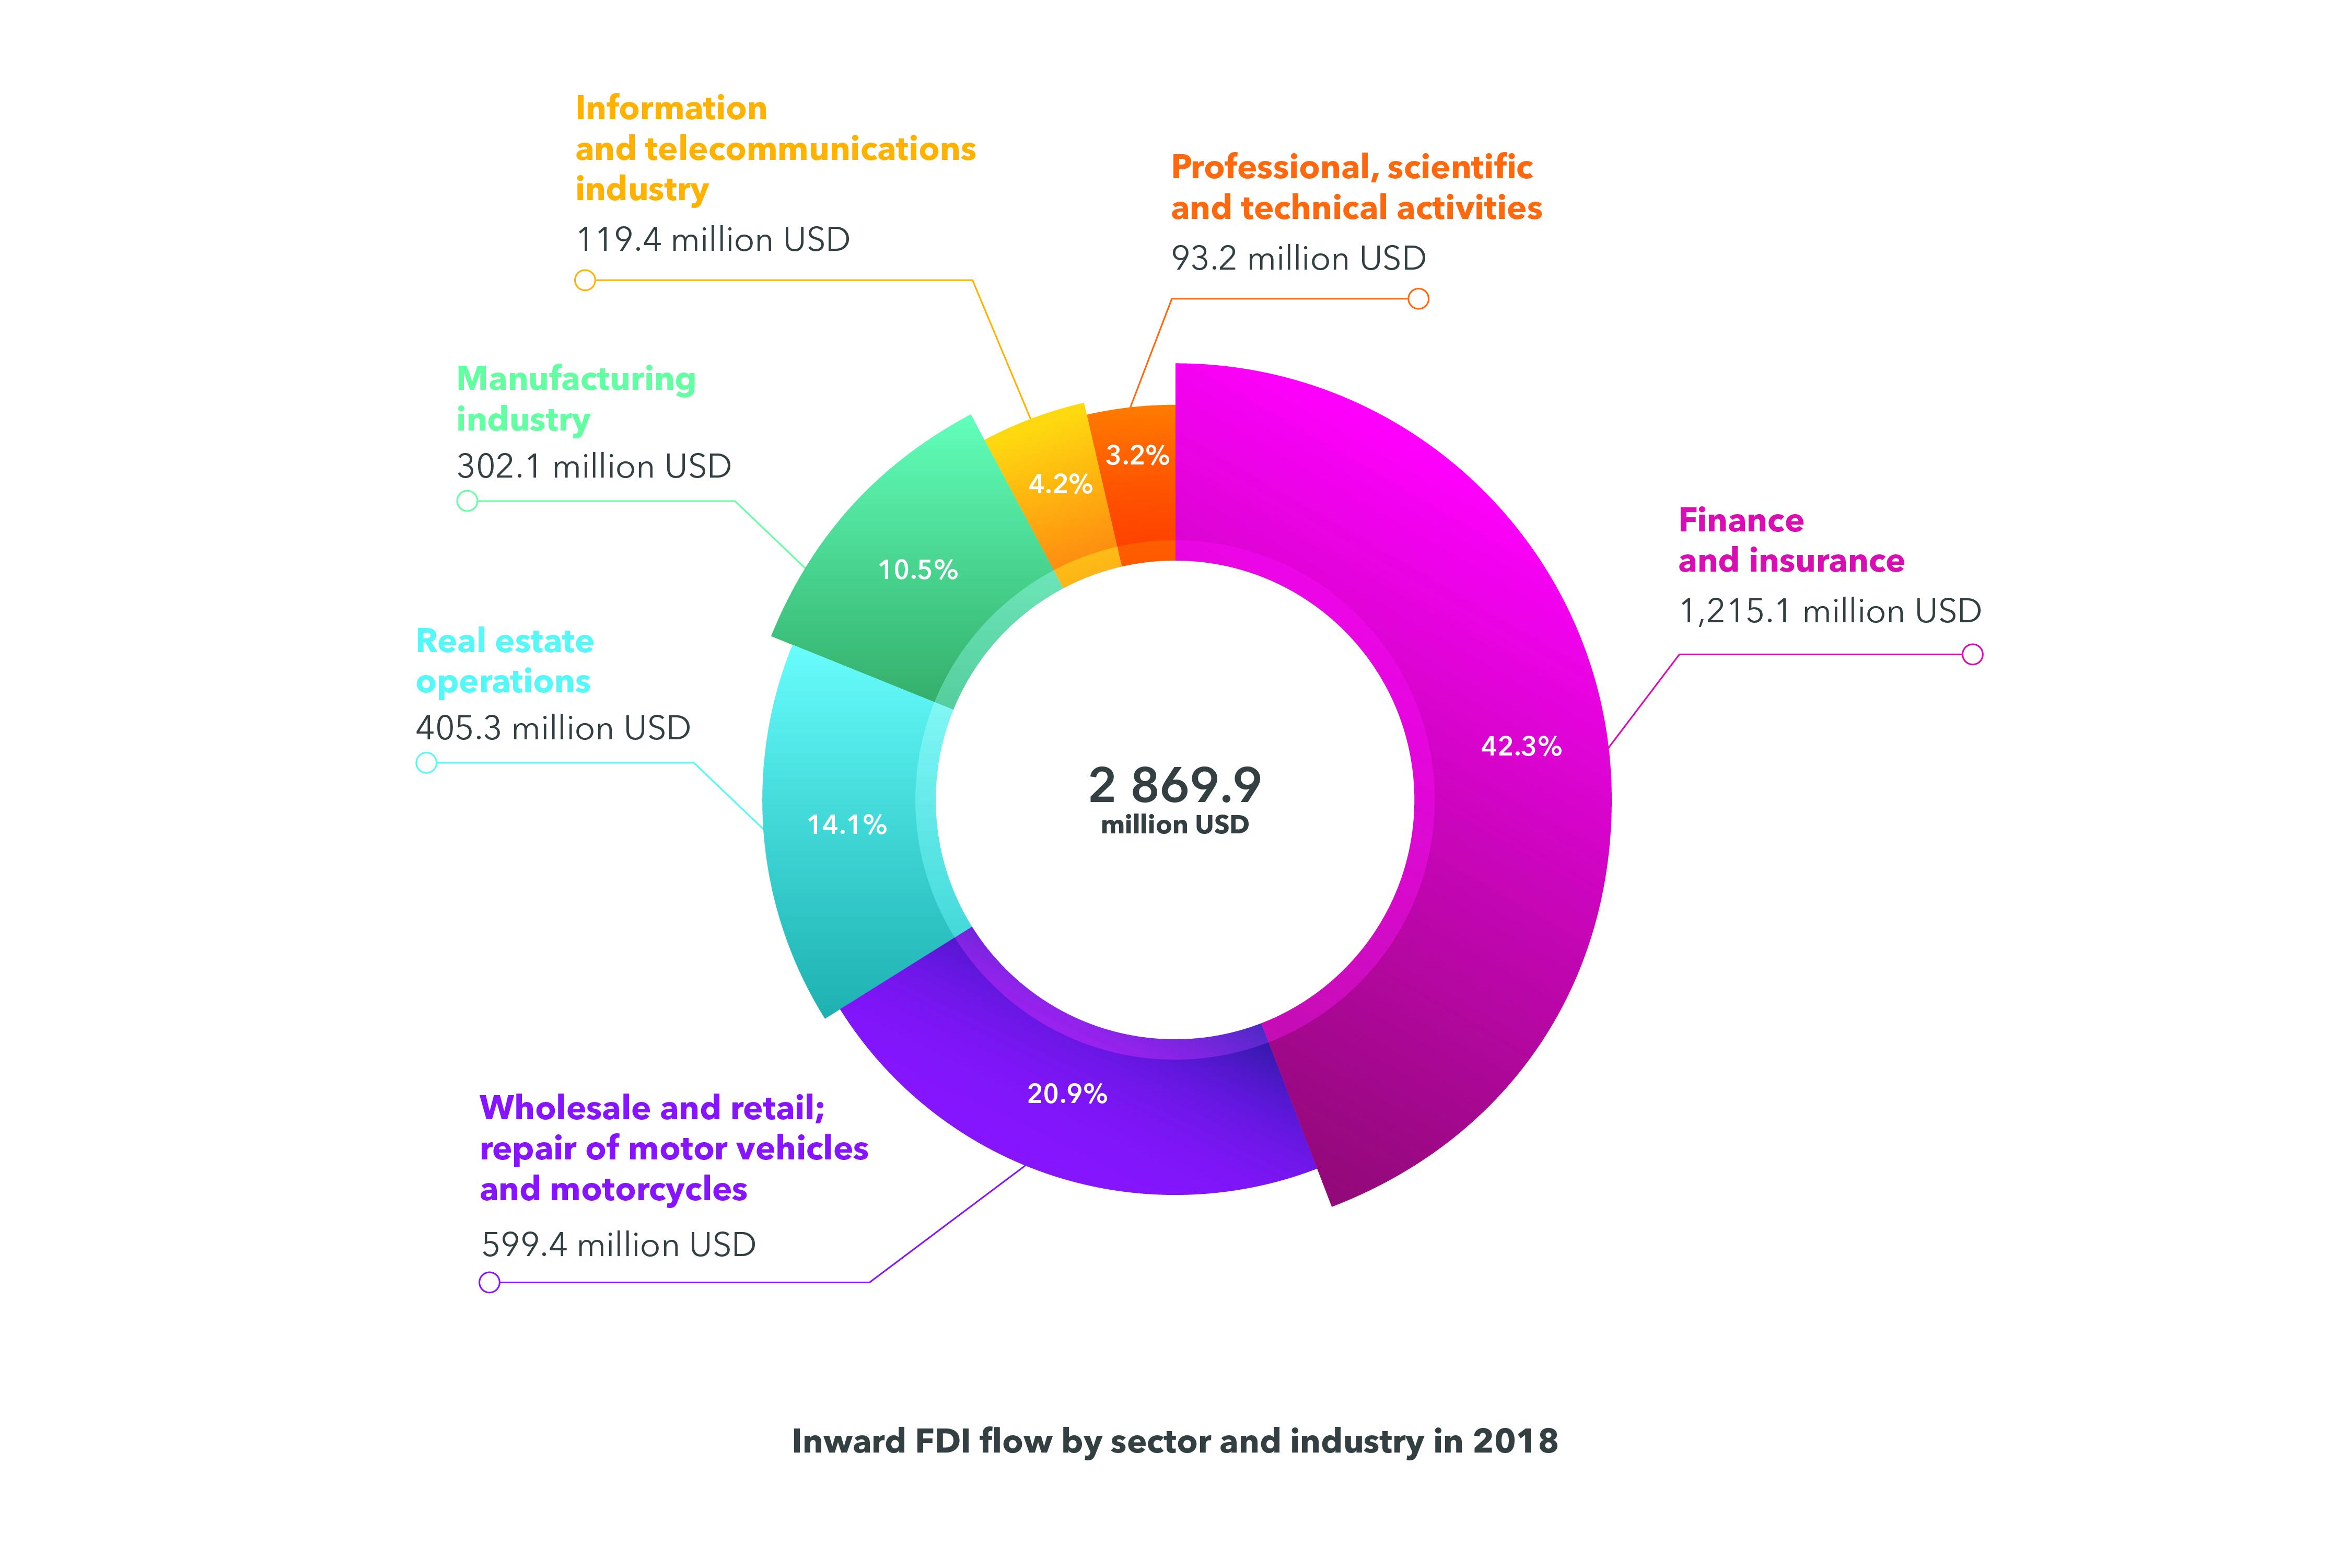 Direct international investments - industries - DLF lawyers Ukraine